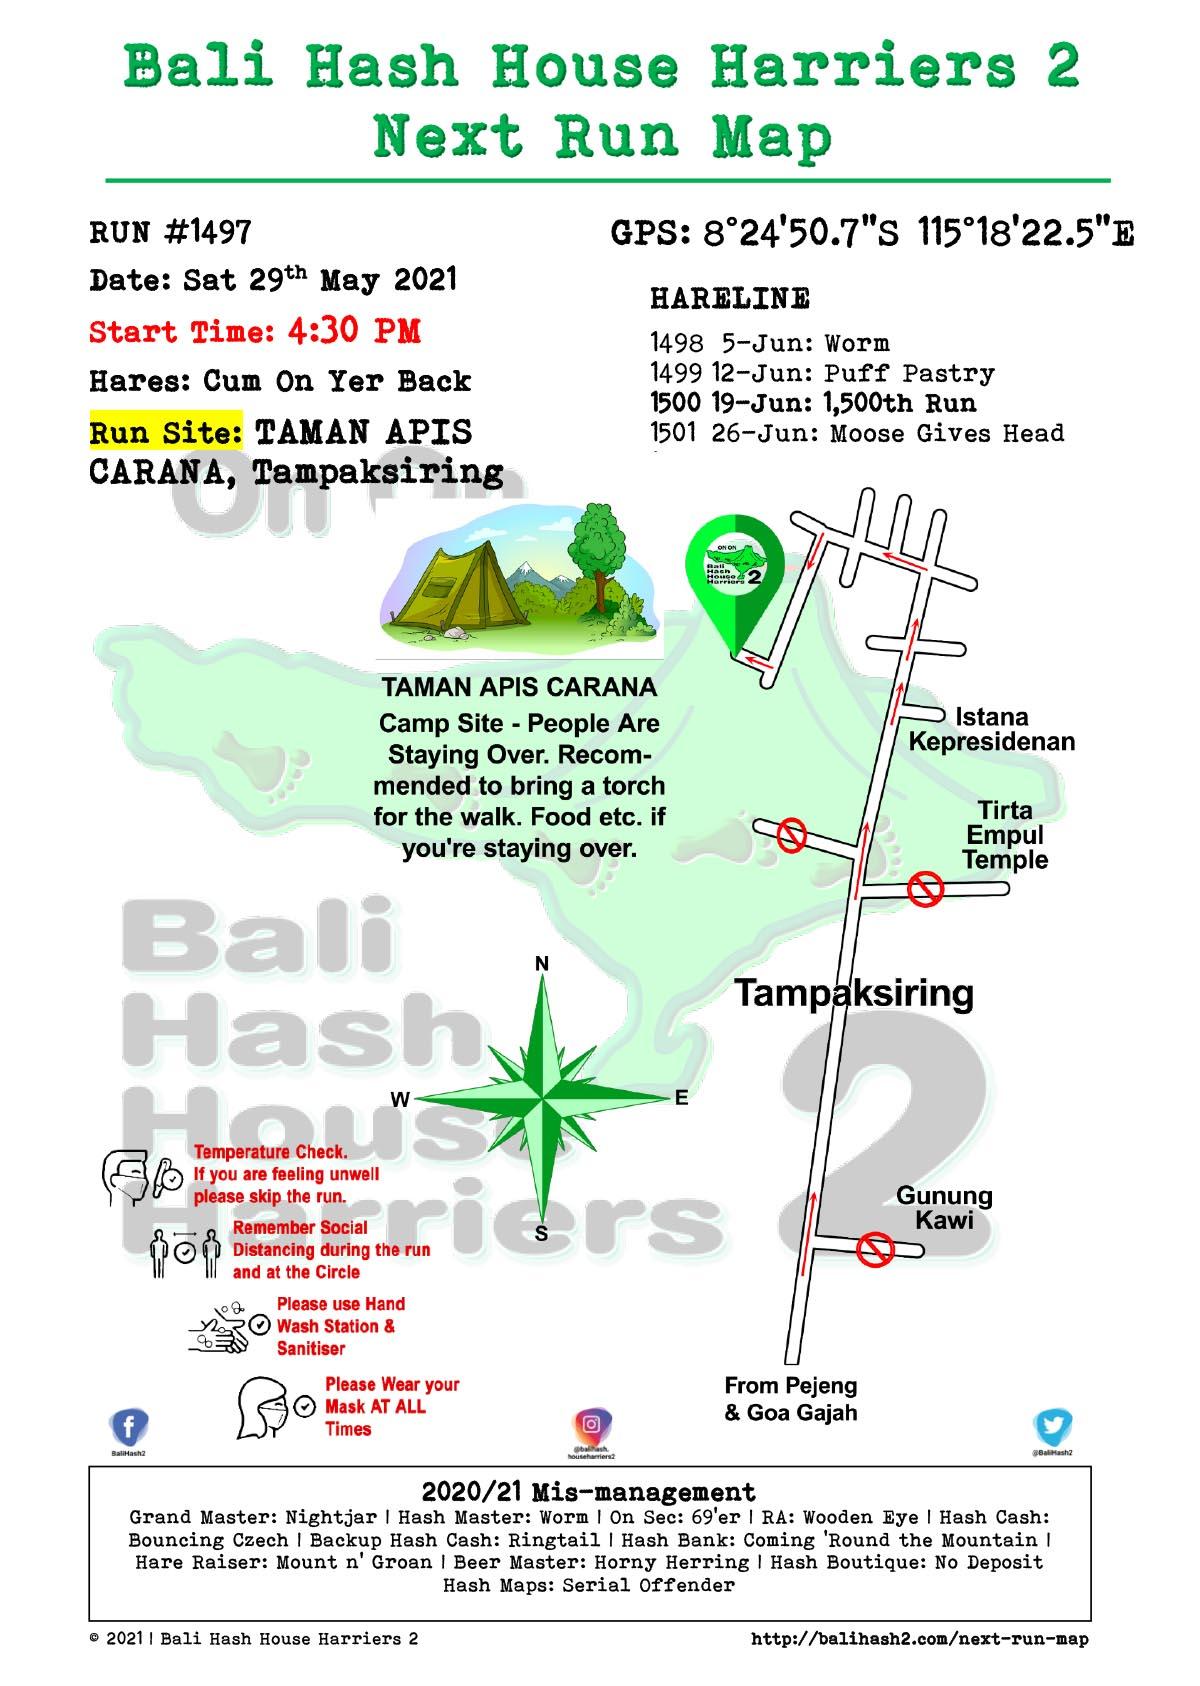 Bali Hash 2 Next Run Map #1497 TAMAN APIS CARANA Tampaksiring 29-May-21